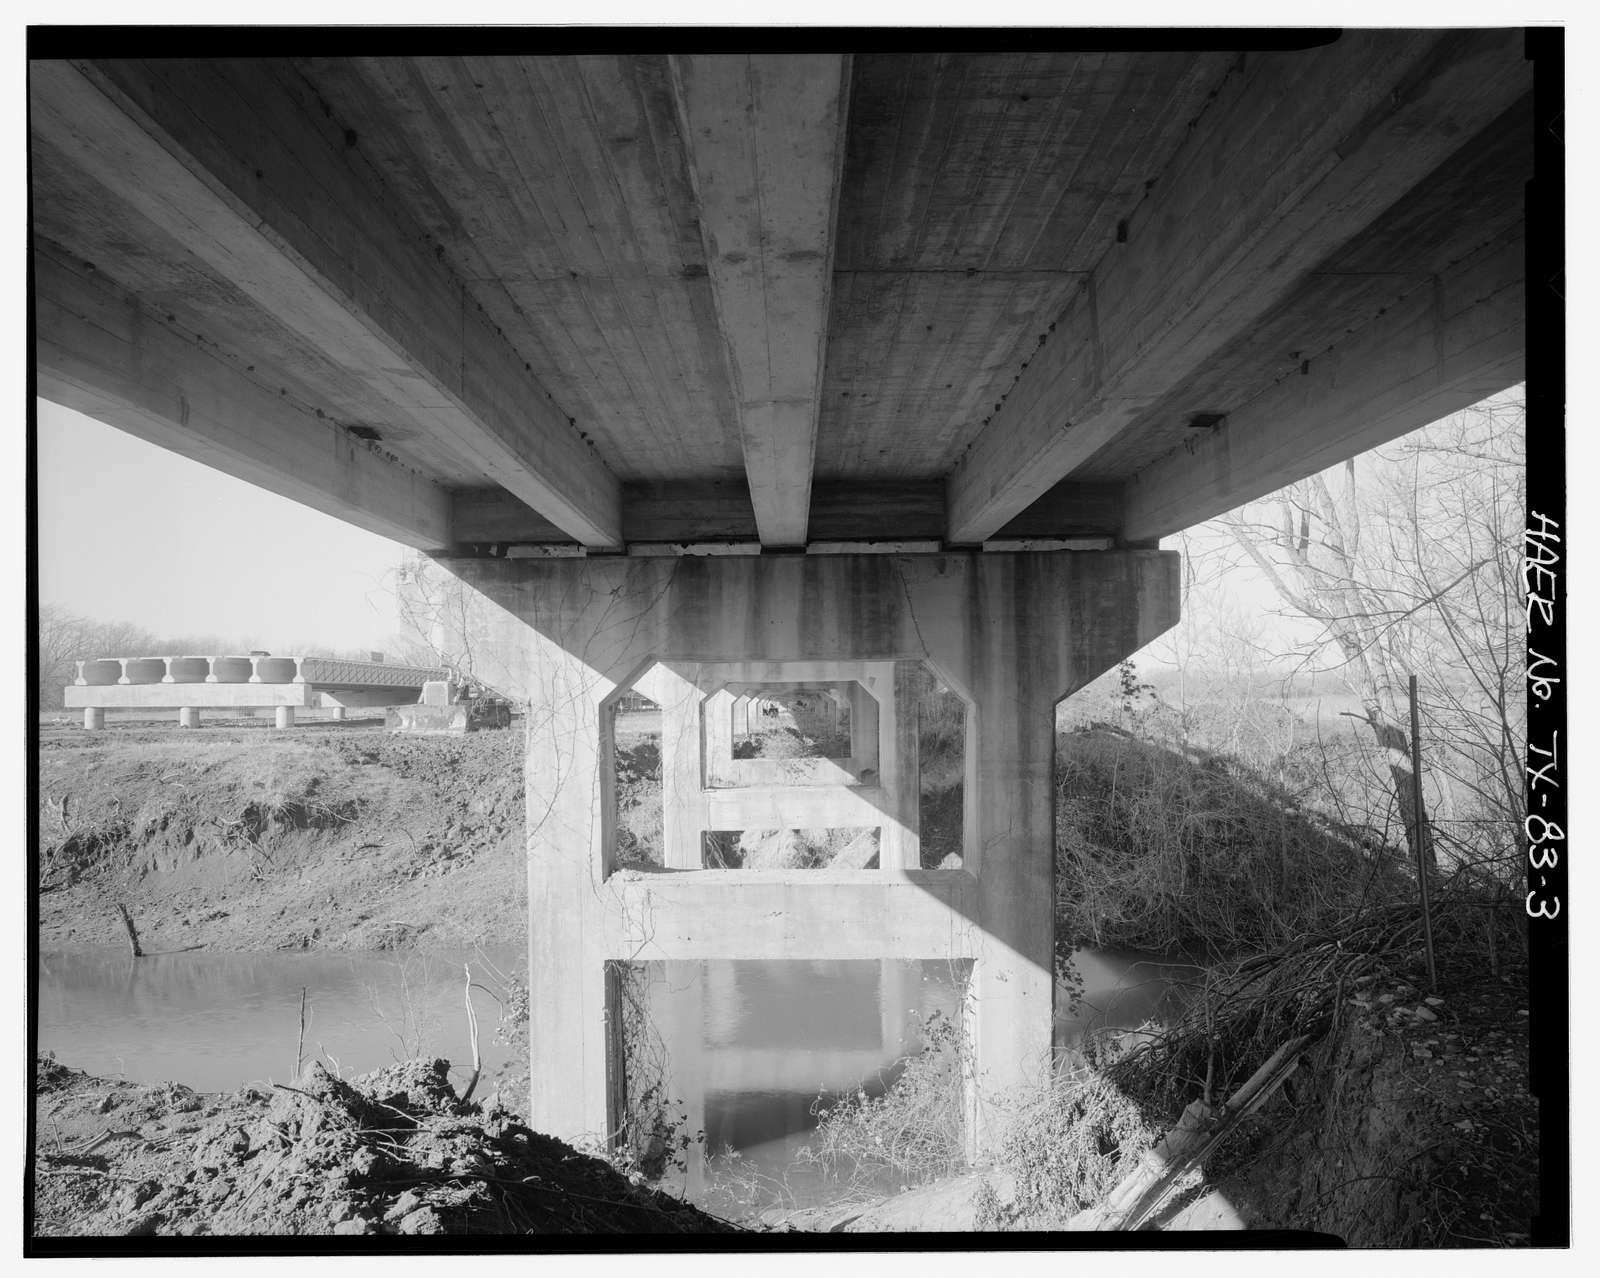 North Bosque River Bridge, Spanning North Bosque River at State Highway 6, Clairette, Erath County, TX